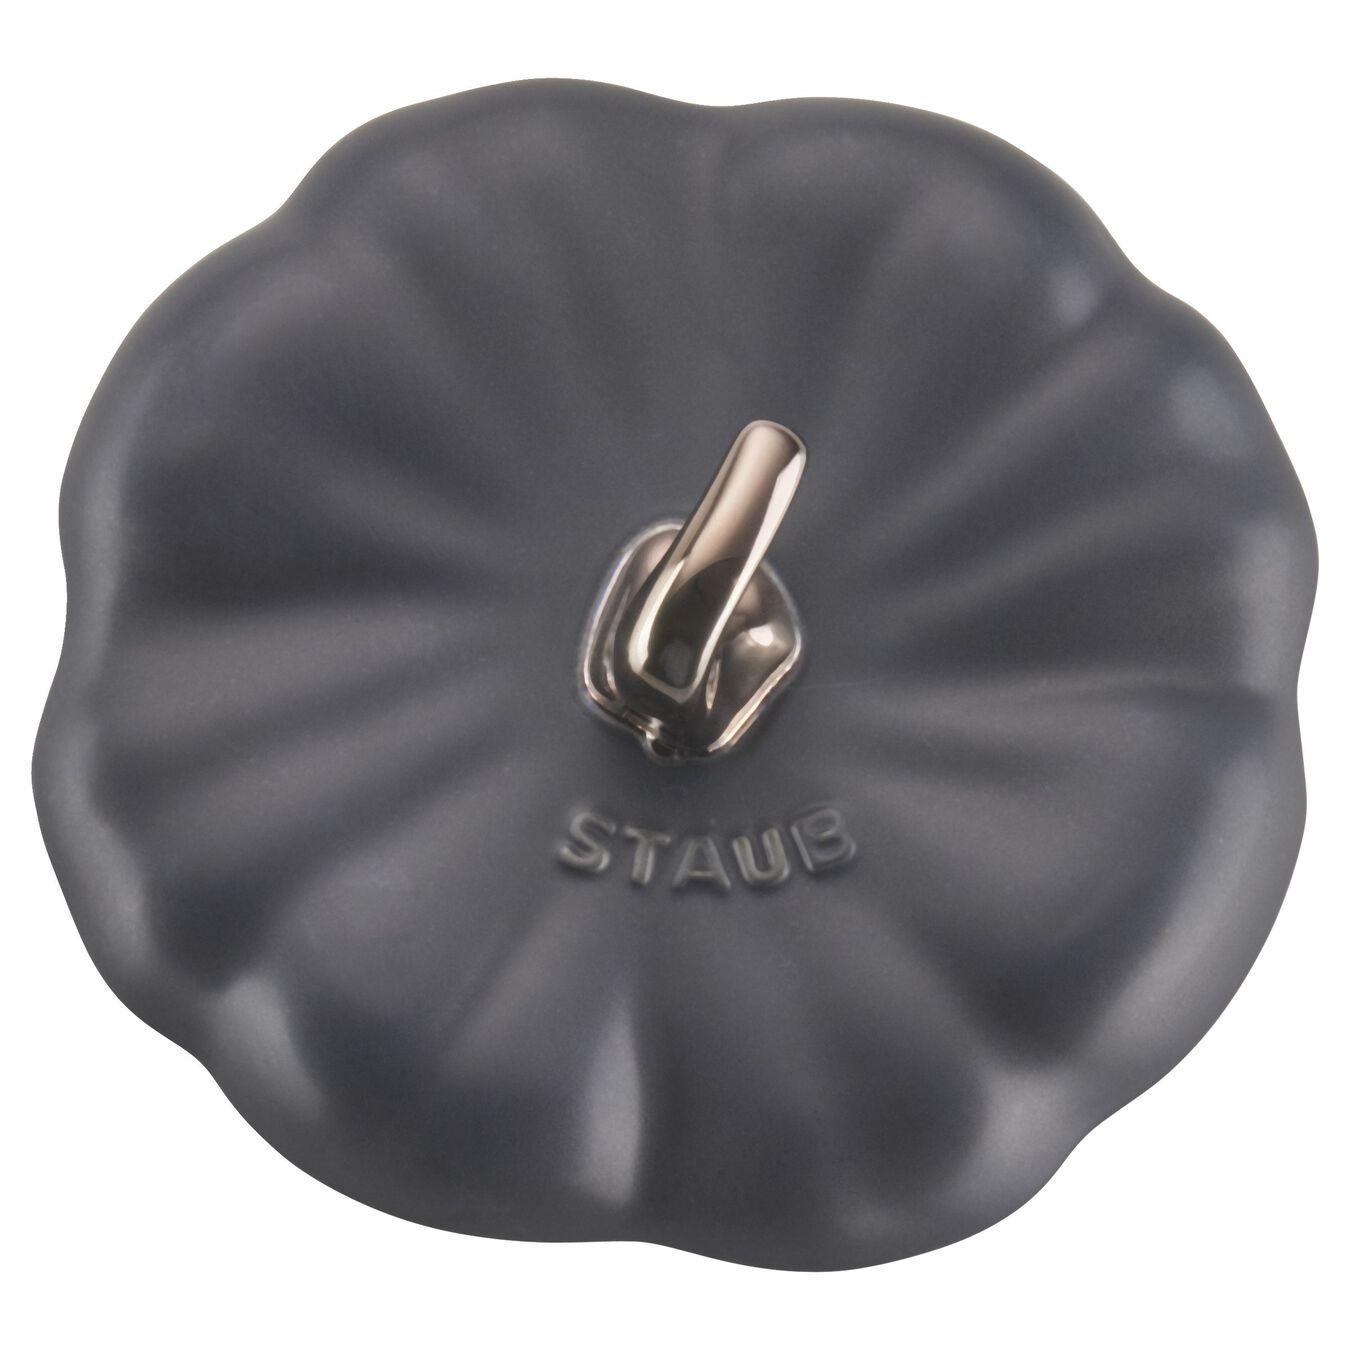 Cocotte zucca - 15 cm, Nera,,large 9